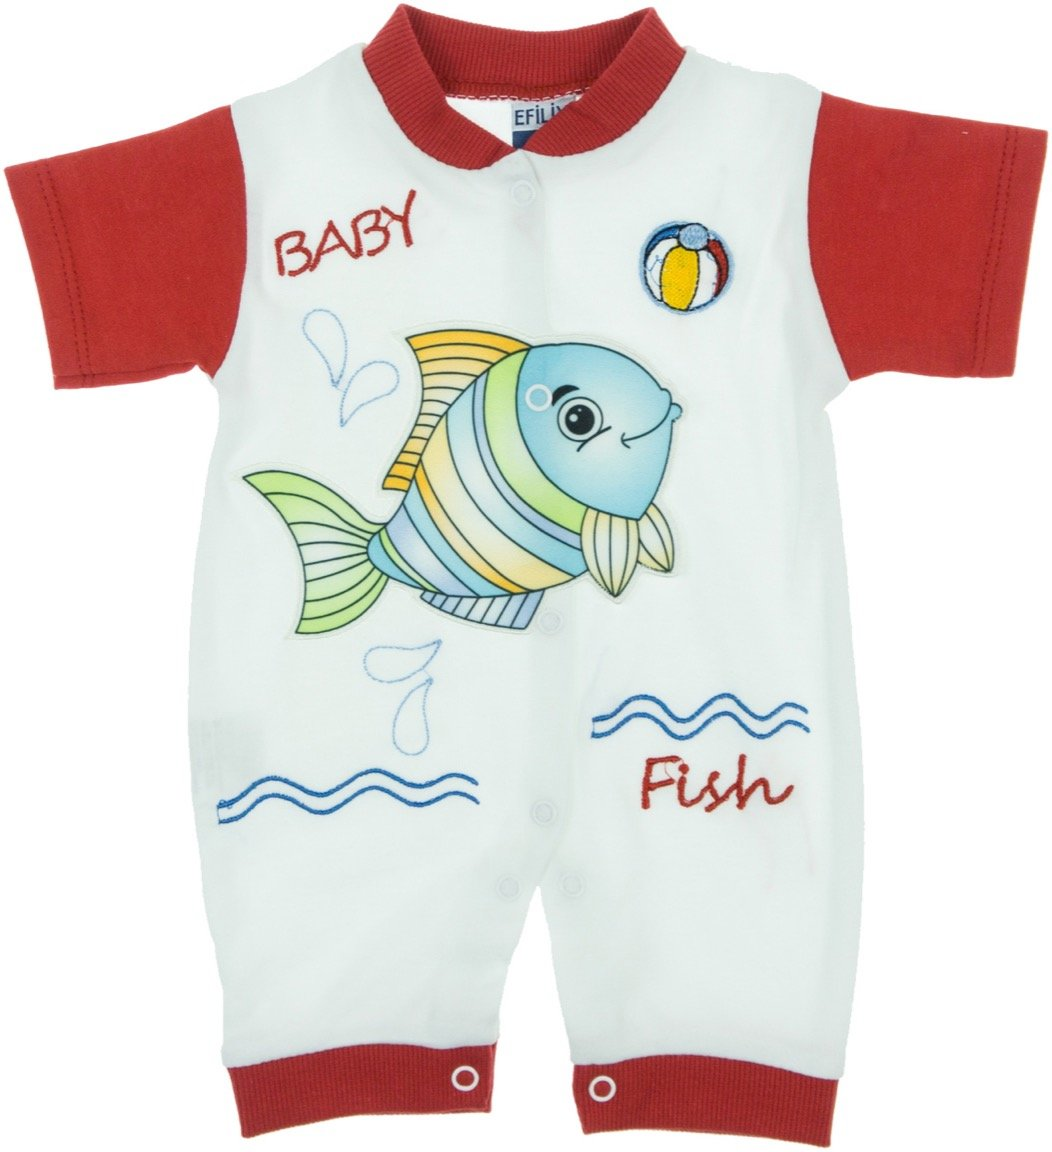 Efilix βρεφικό φορμάκι «Baby Fish»